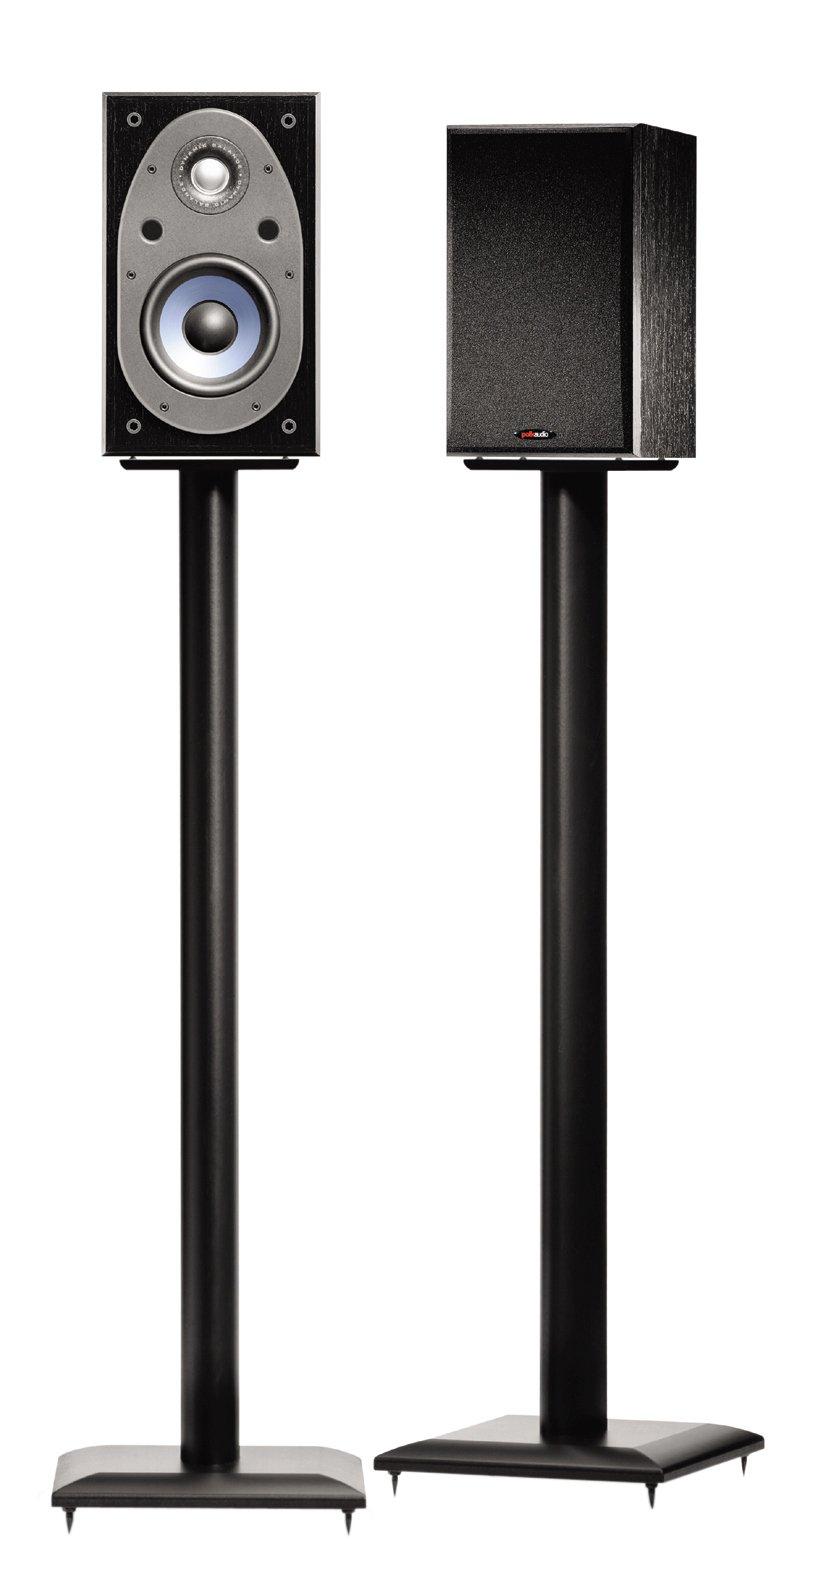 Sanus NF36B 36'' Natural Foundations Speaker Stand Black by Sanus